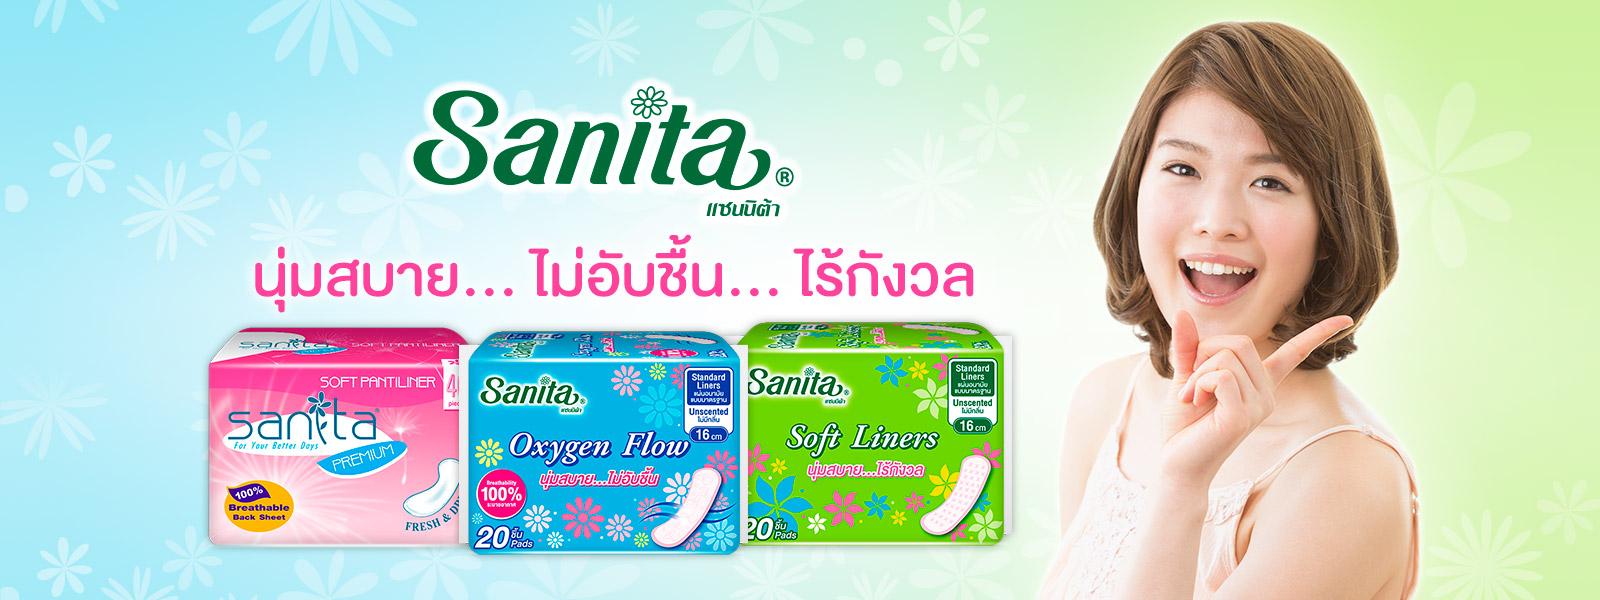 sanita liners แซนนิต้า แผ่นอนามัย